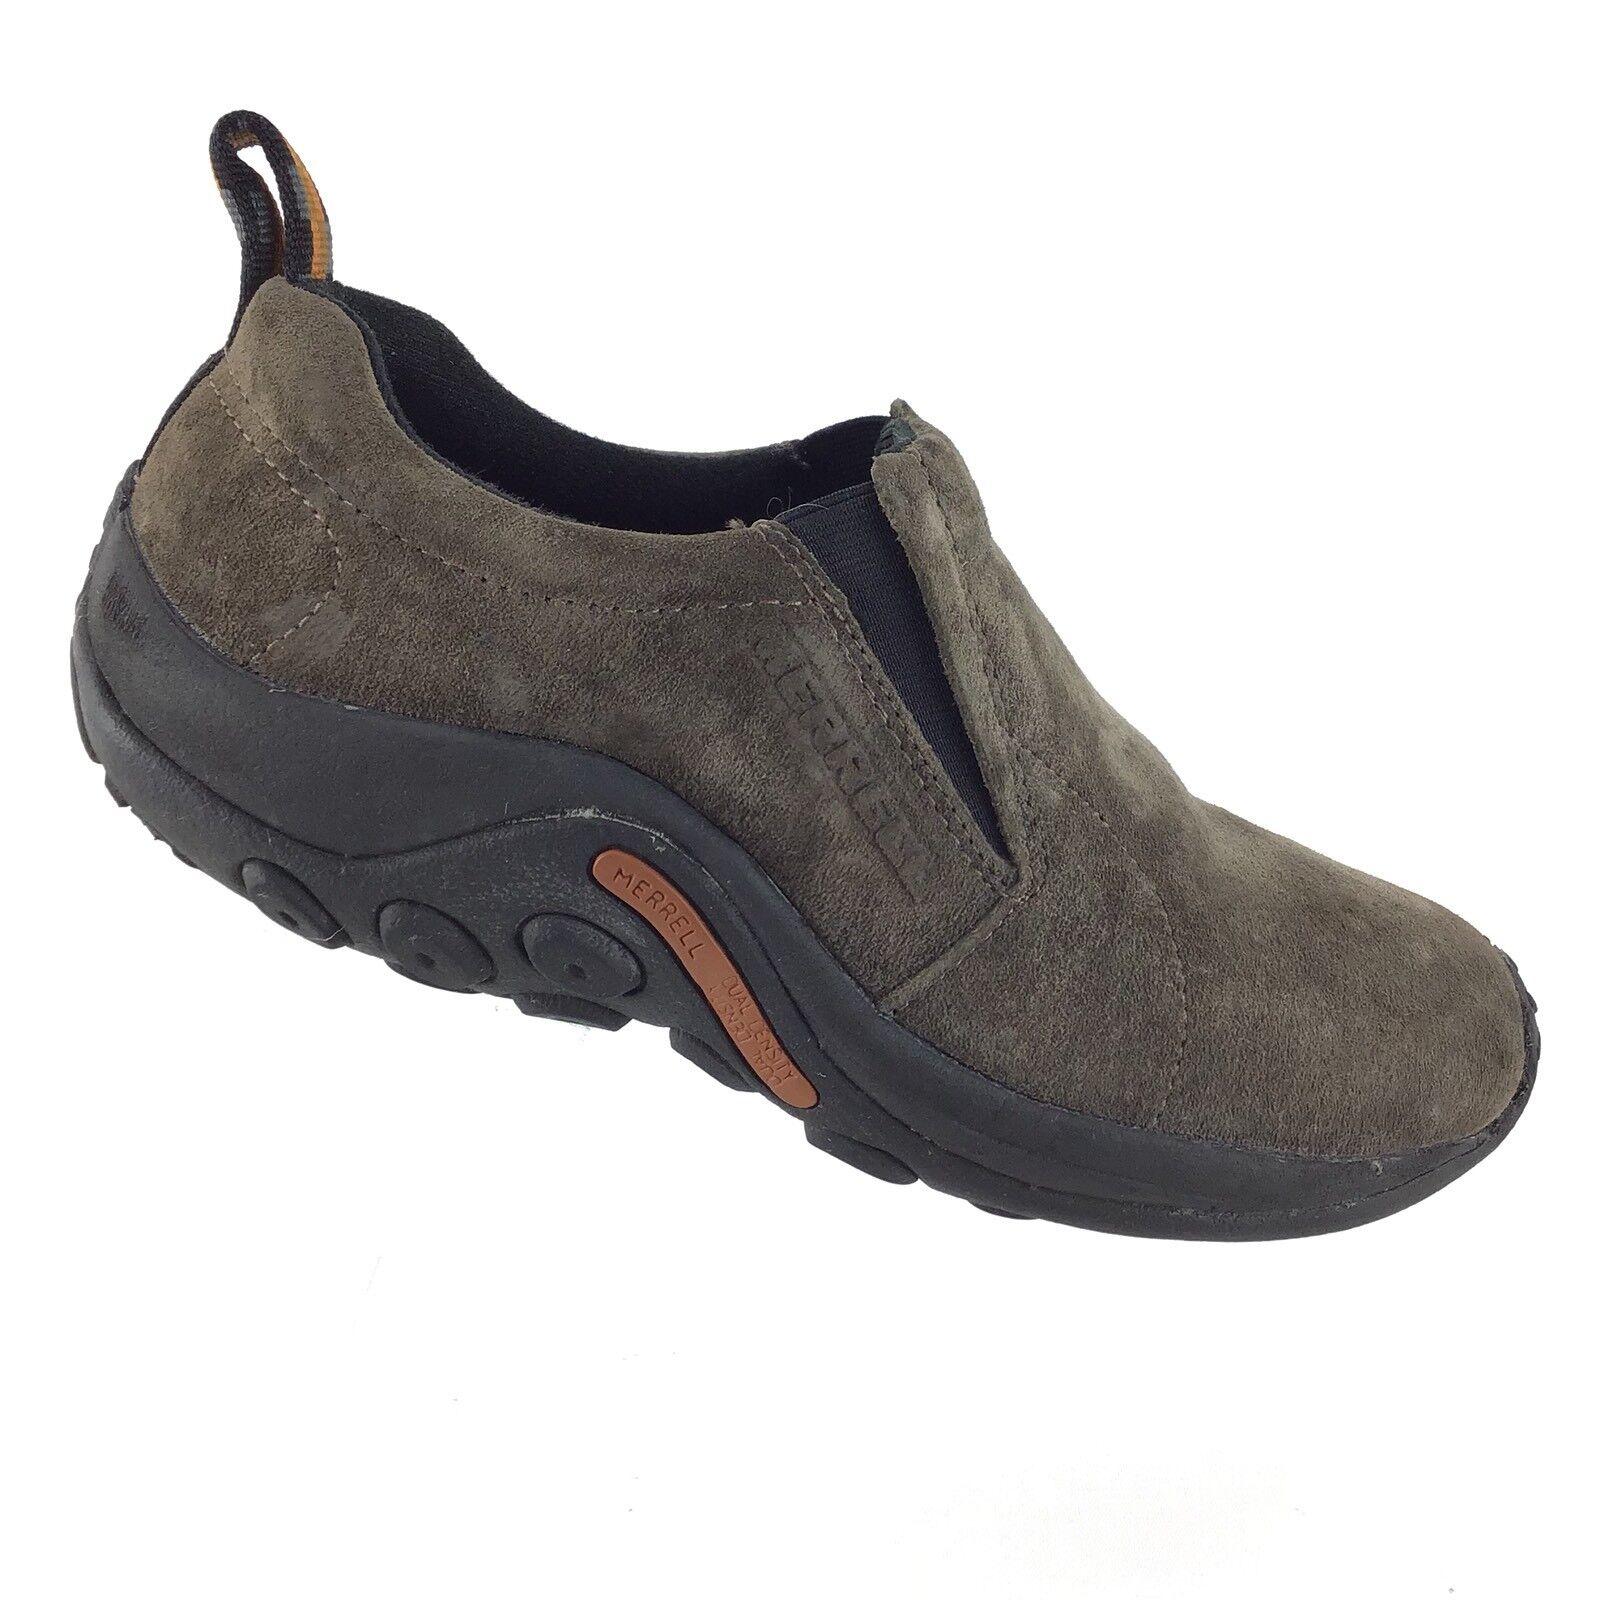 Merrell Gunsmoke Jungle Moc Suede Leather Slip On Comfort Womens 8 shoes R7S2